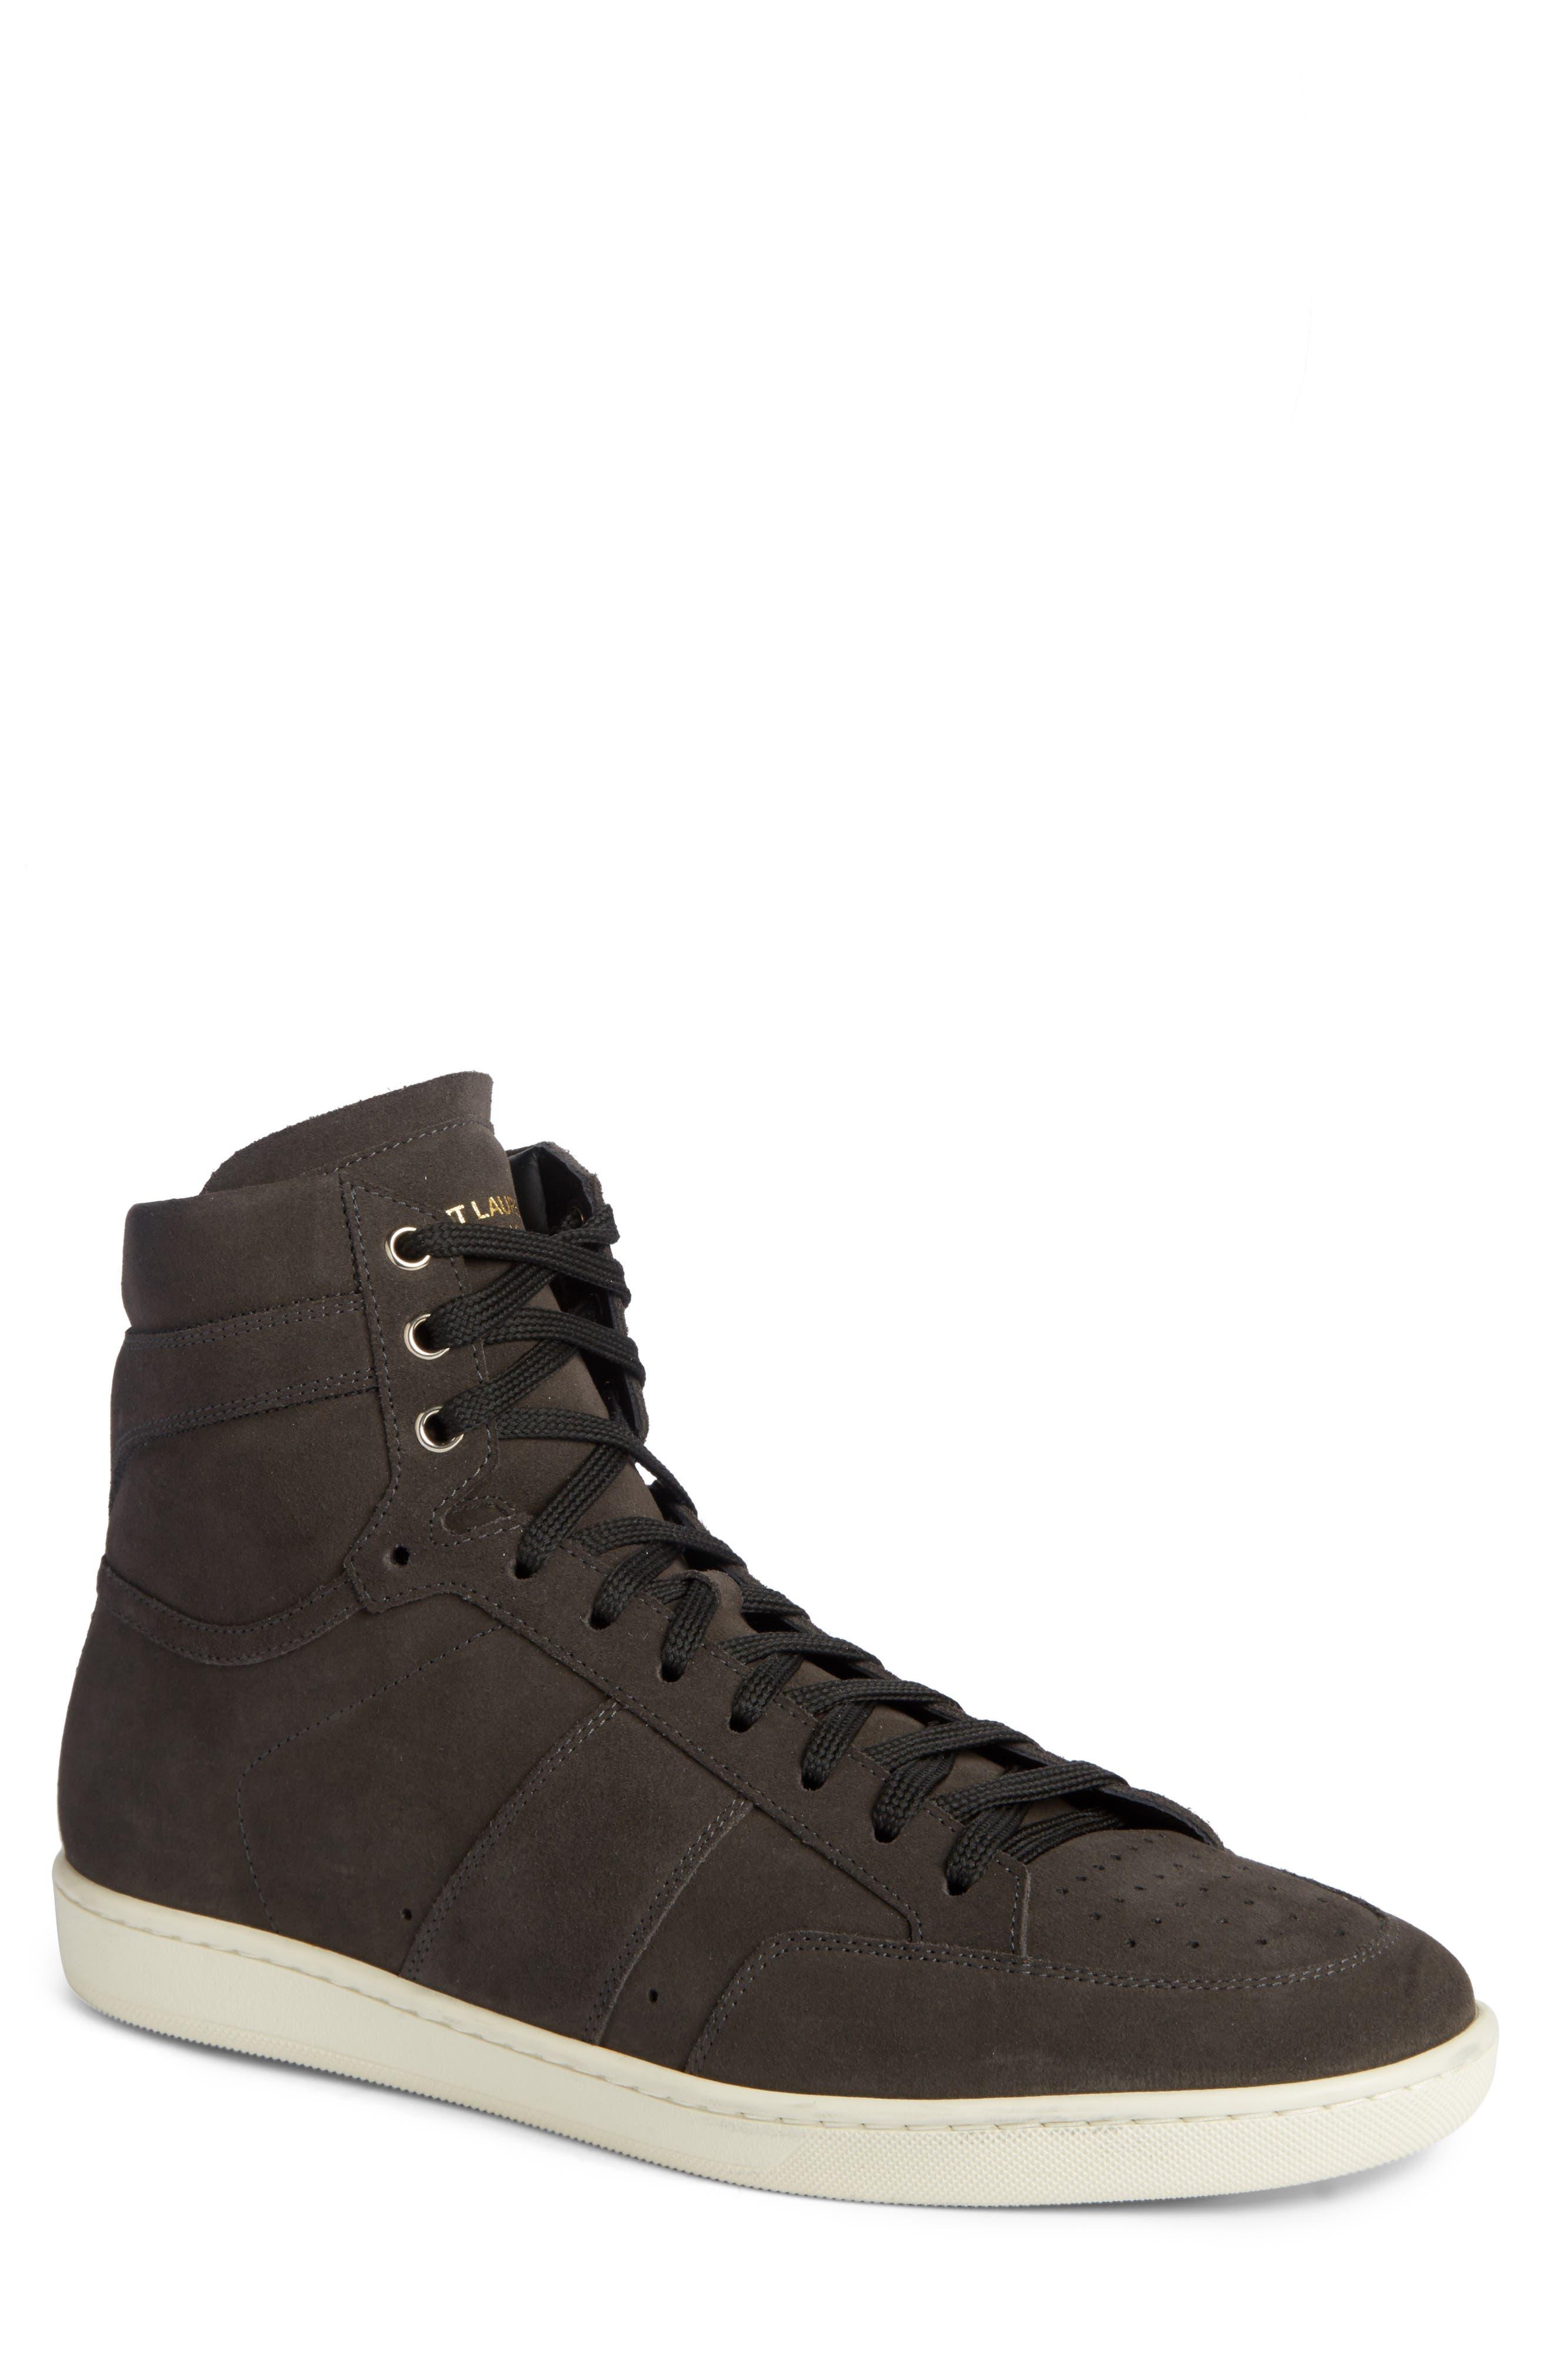 High Top Sneaker,                             Main thumbnail 1, color,                             028